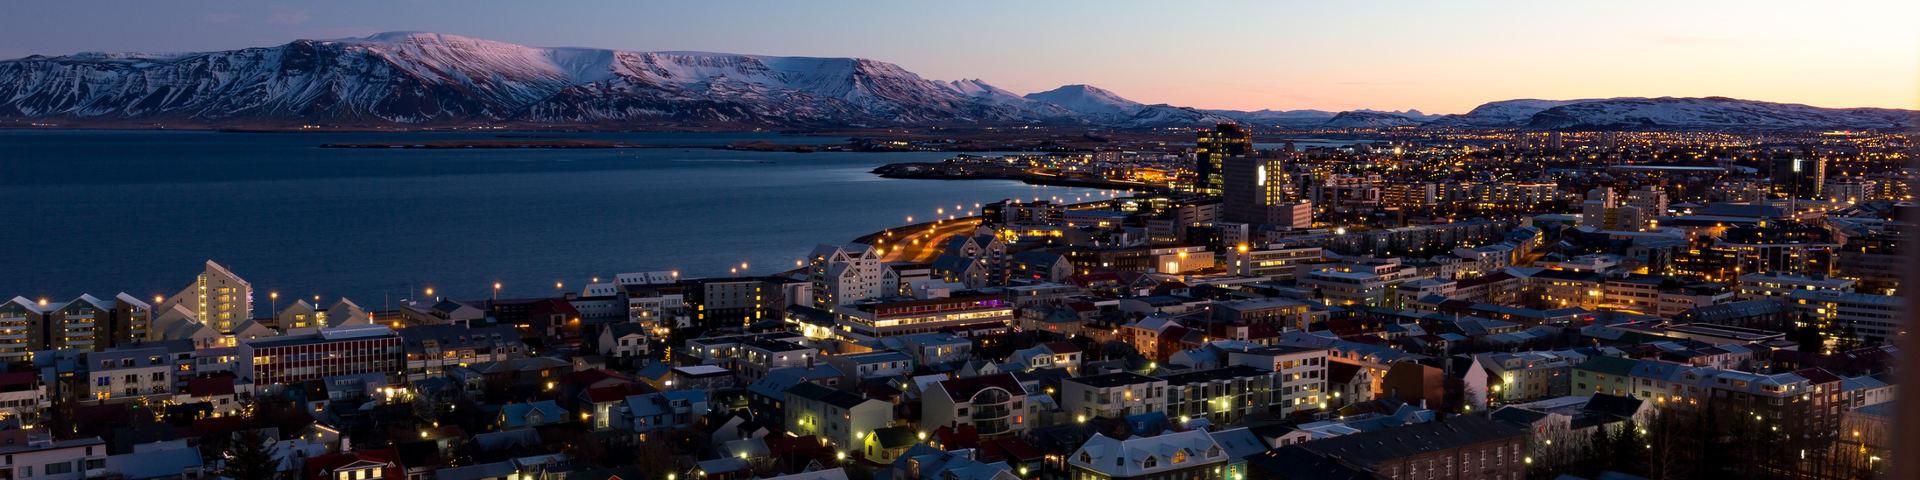 Reykjavik hero banner